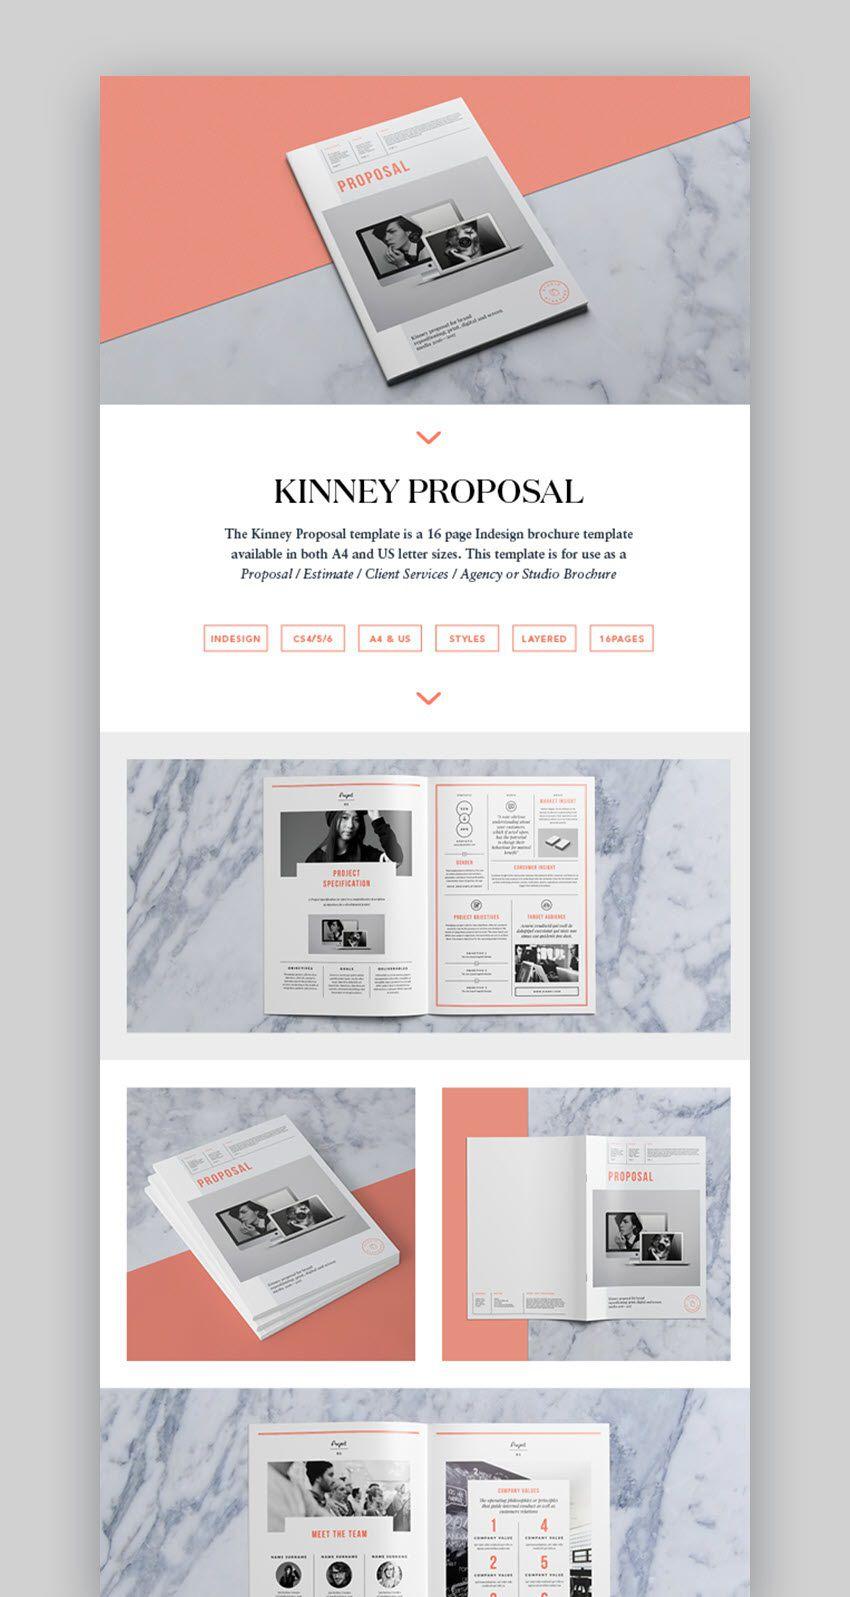 005 Impressive Graphic Design Proposal Sample Inspiration  Pdf Free Template IndesignFull